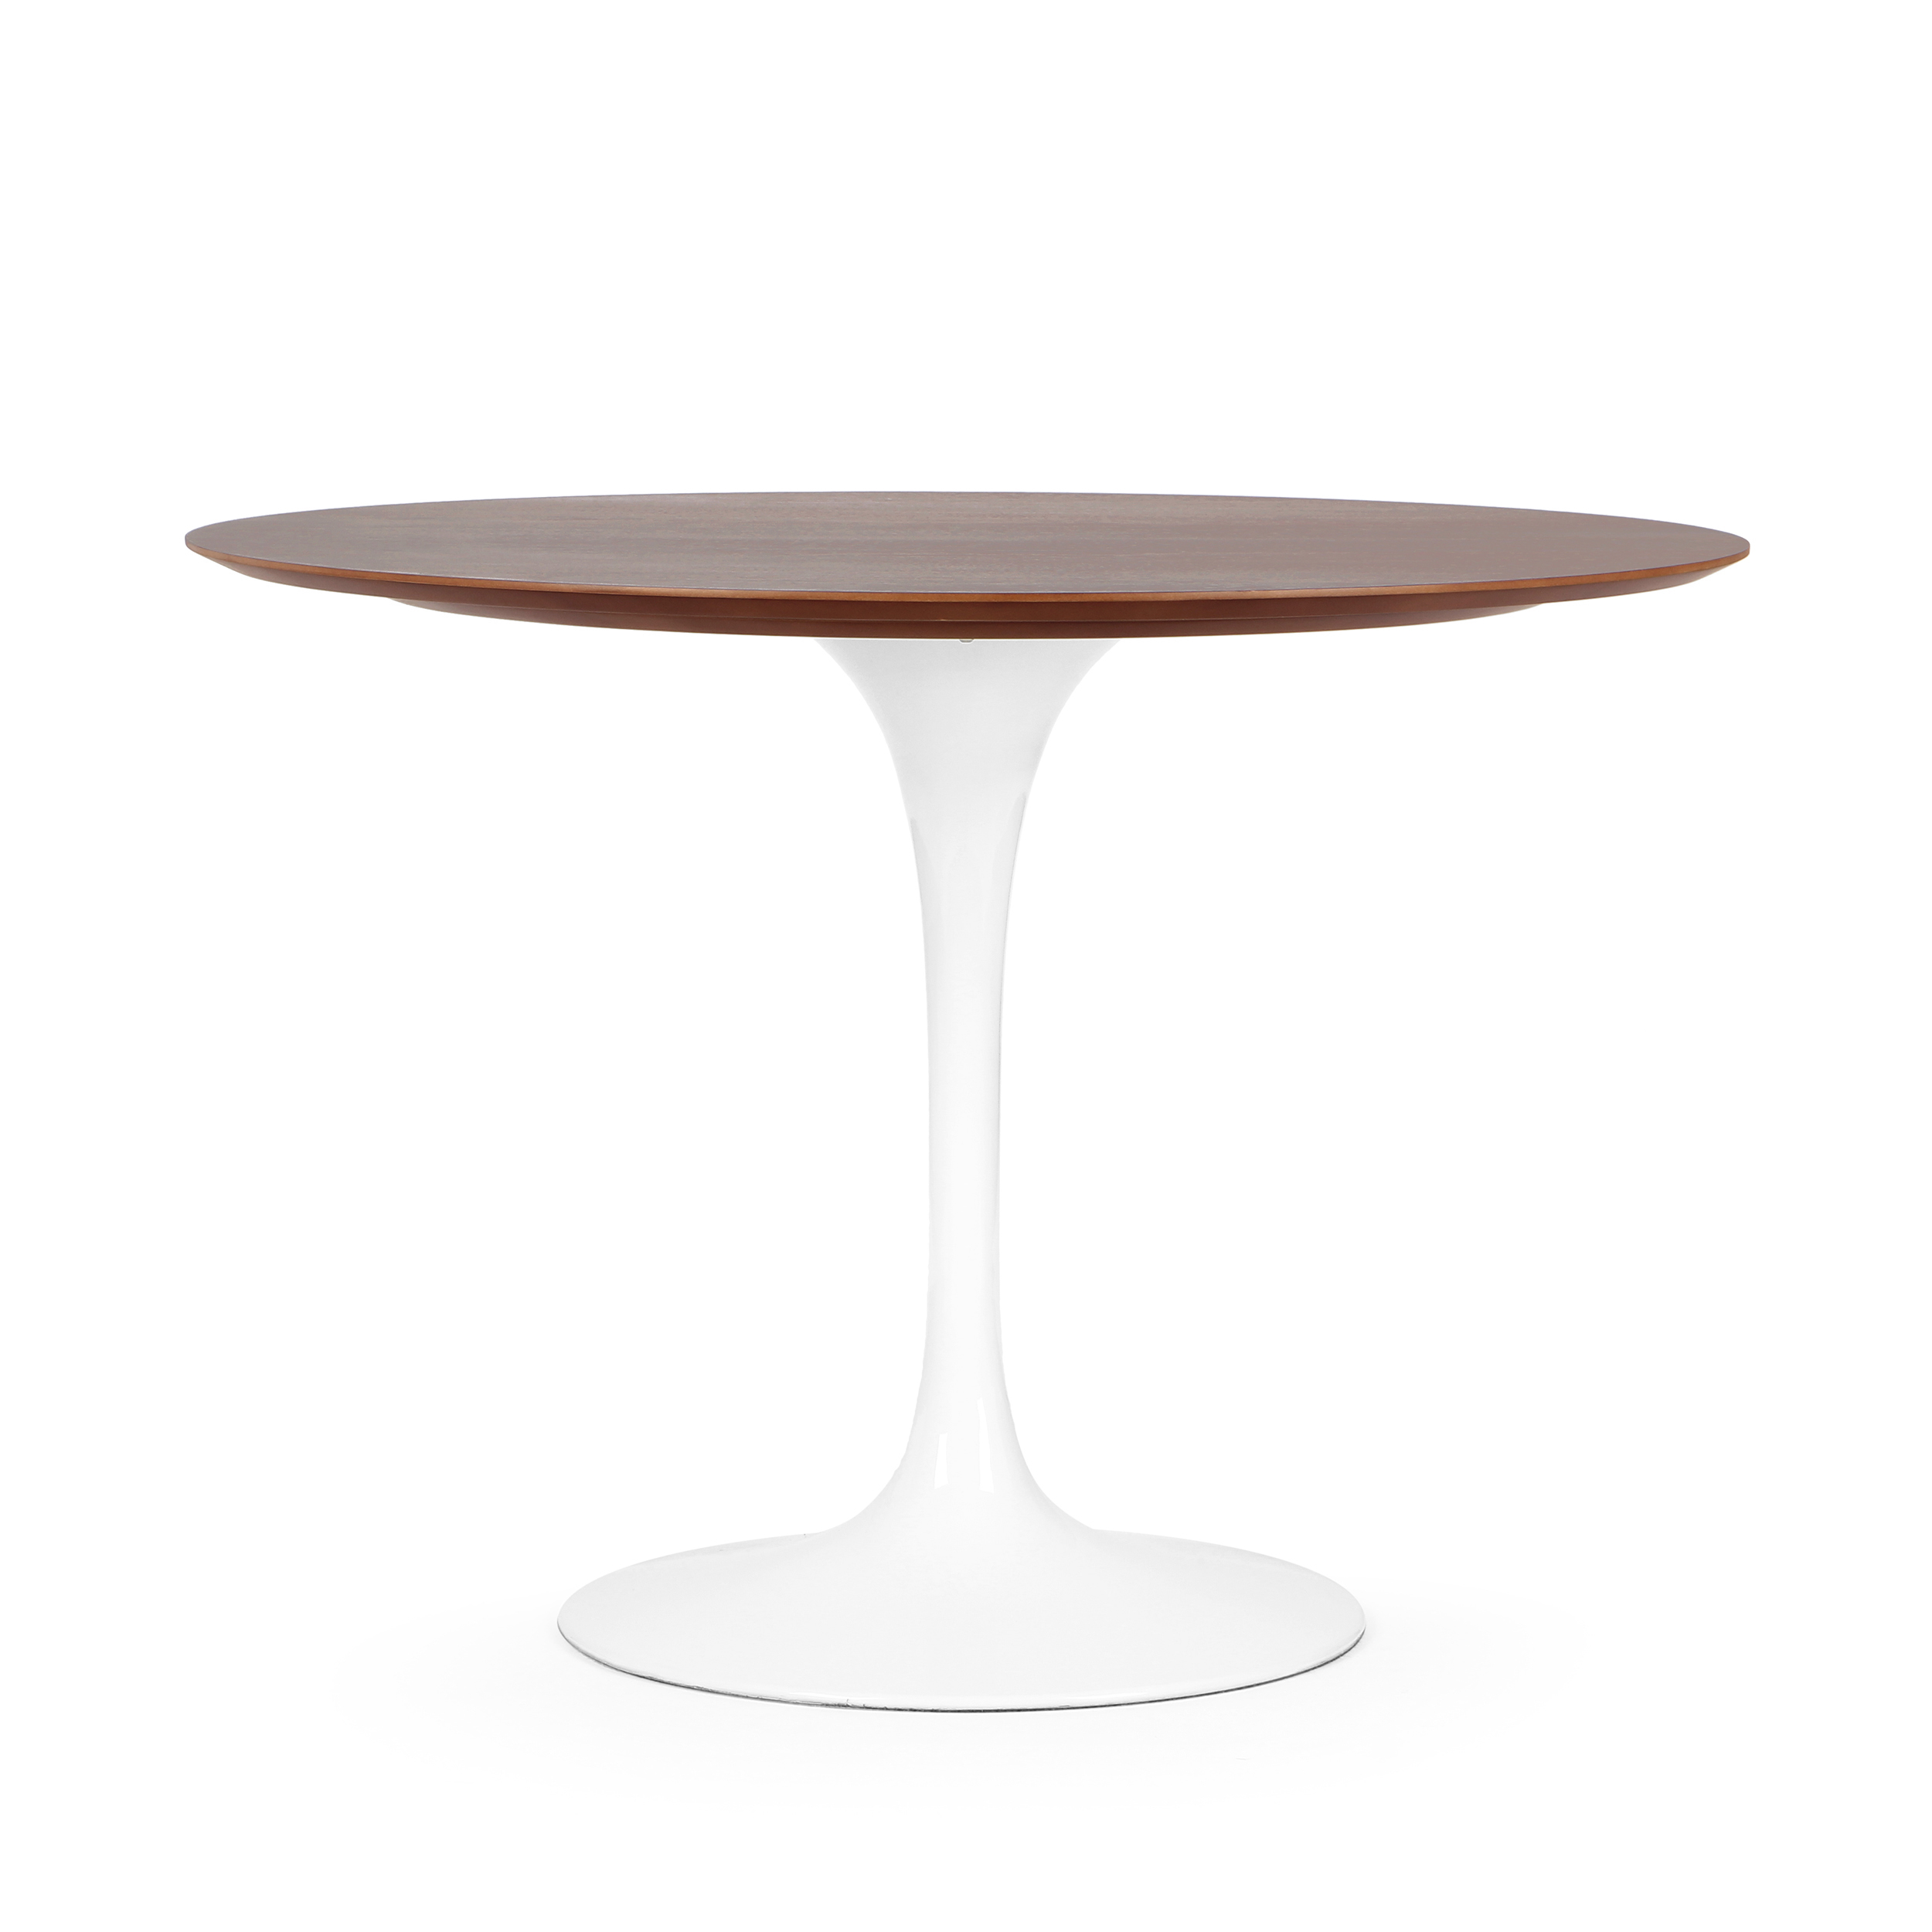 Стол обеденный круглый DT6131D new